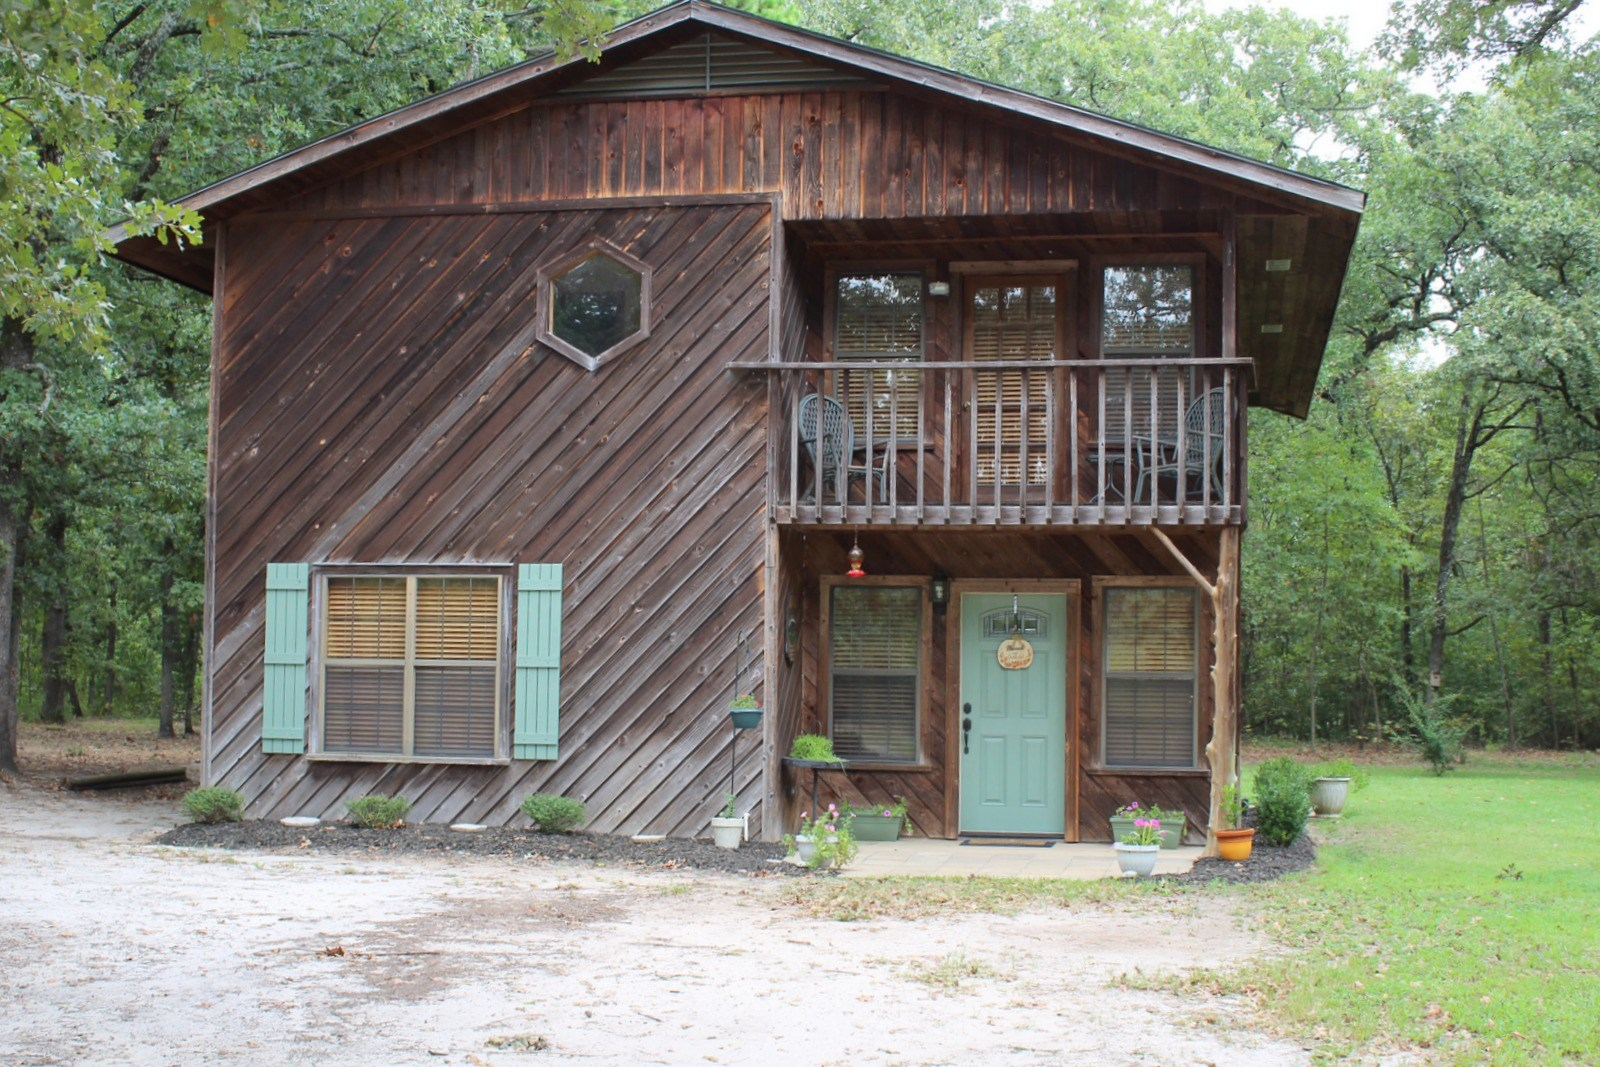 11 EAST TEXAS ACRES - LARGE SHOP - RV HOOKUPS - 4BR-2BA HOME